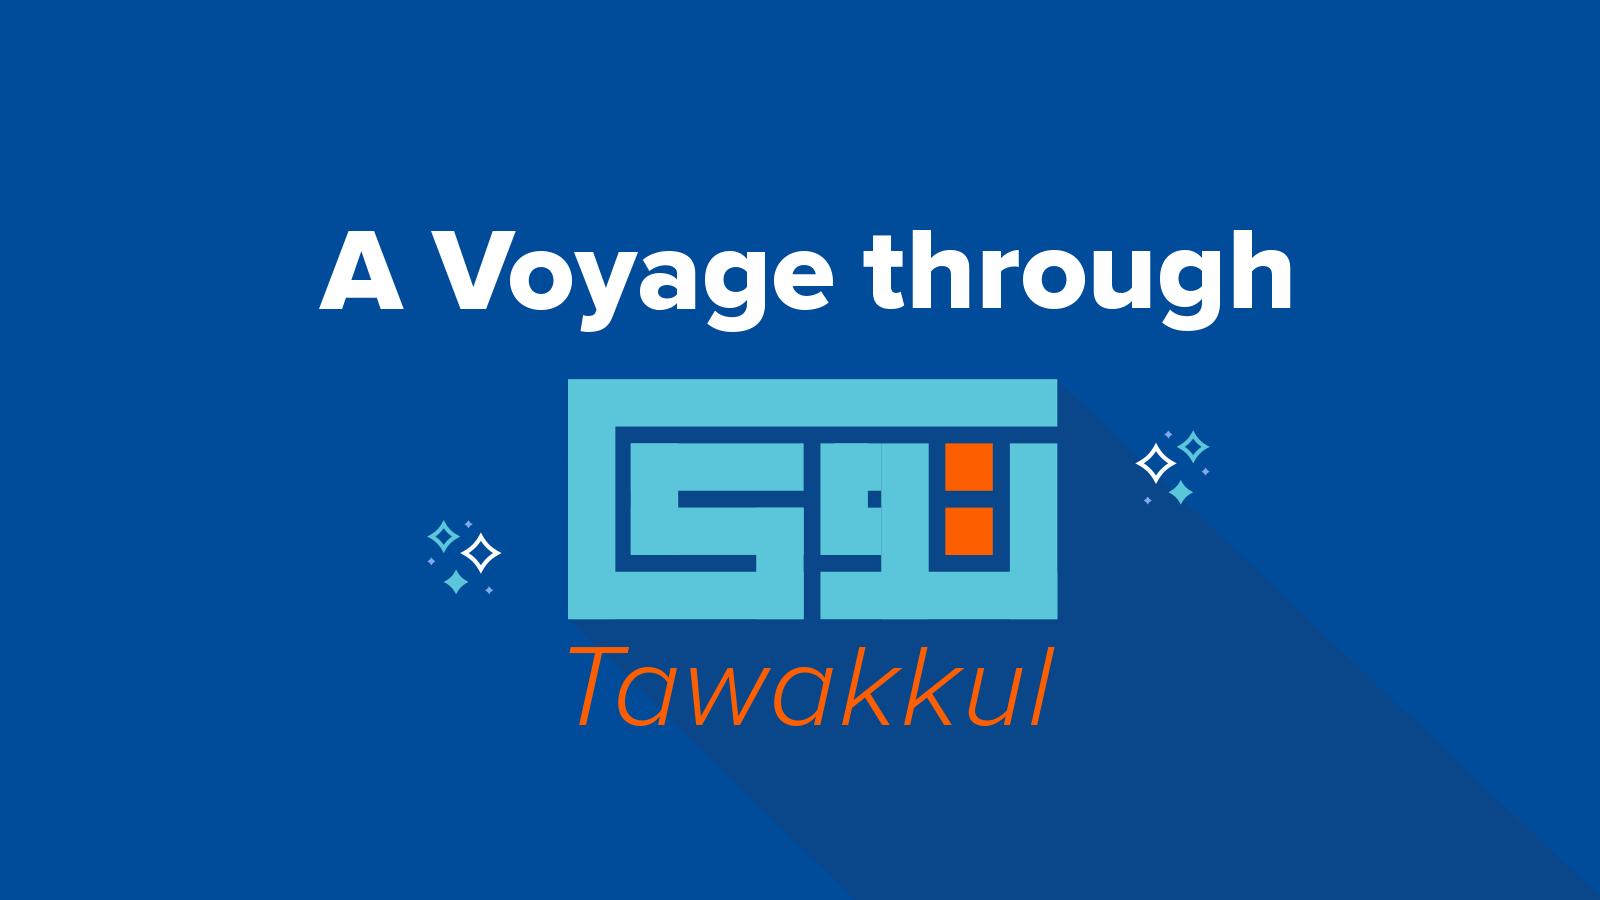 A Voyage Through Tawakkul